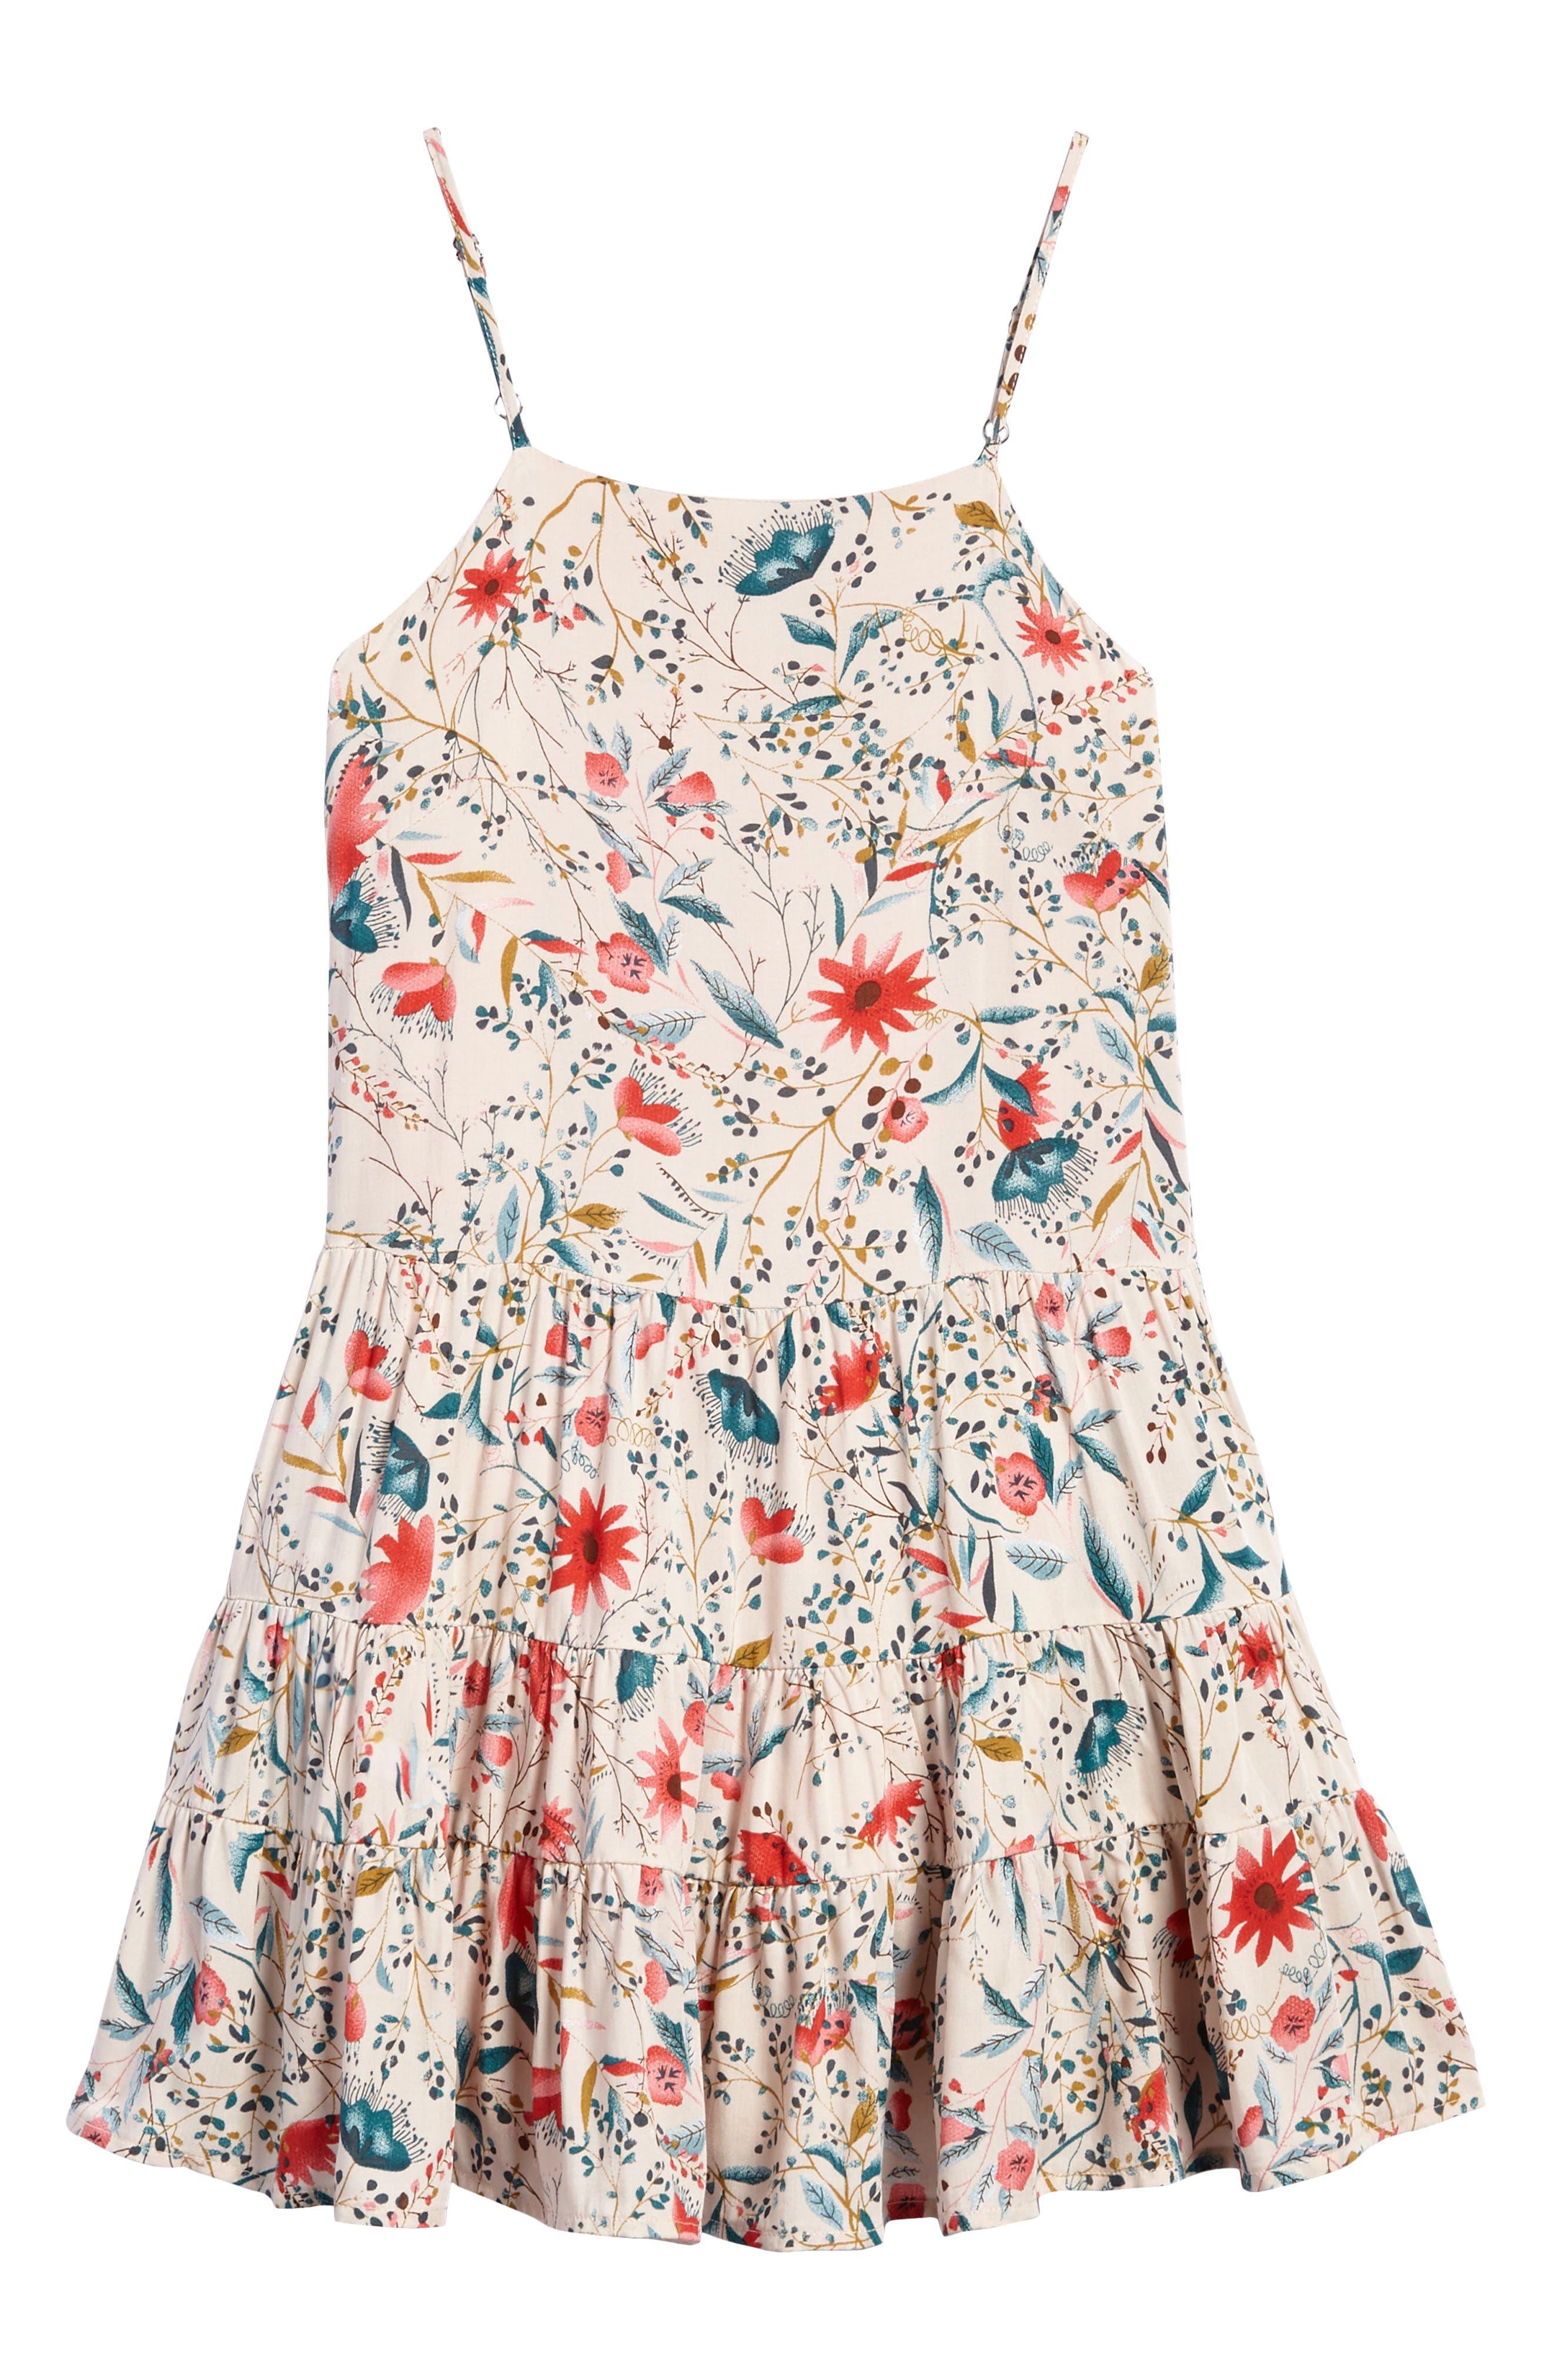 Alternate Image 1 Selected - For All Seasons Print Flounce Sundress (Big Girls)